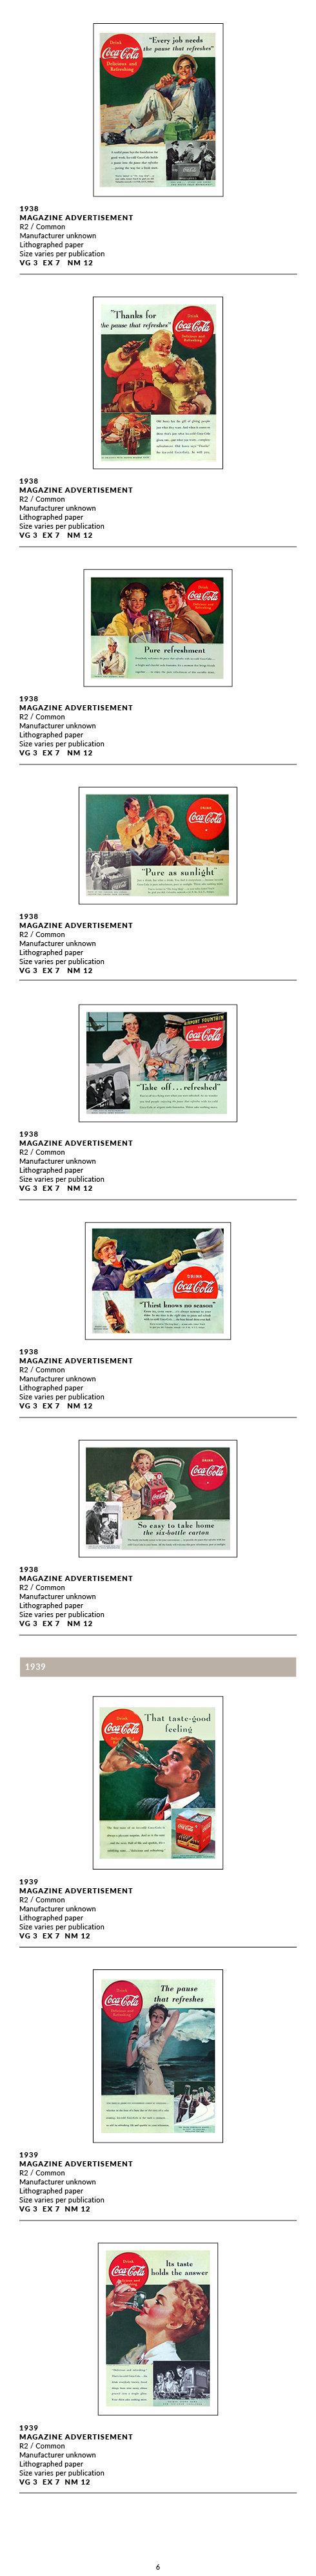 1935-39 Ads6.jpg